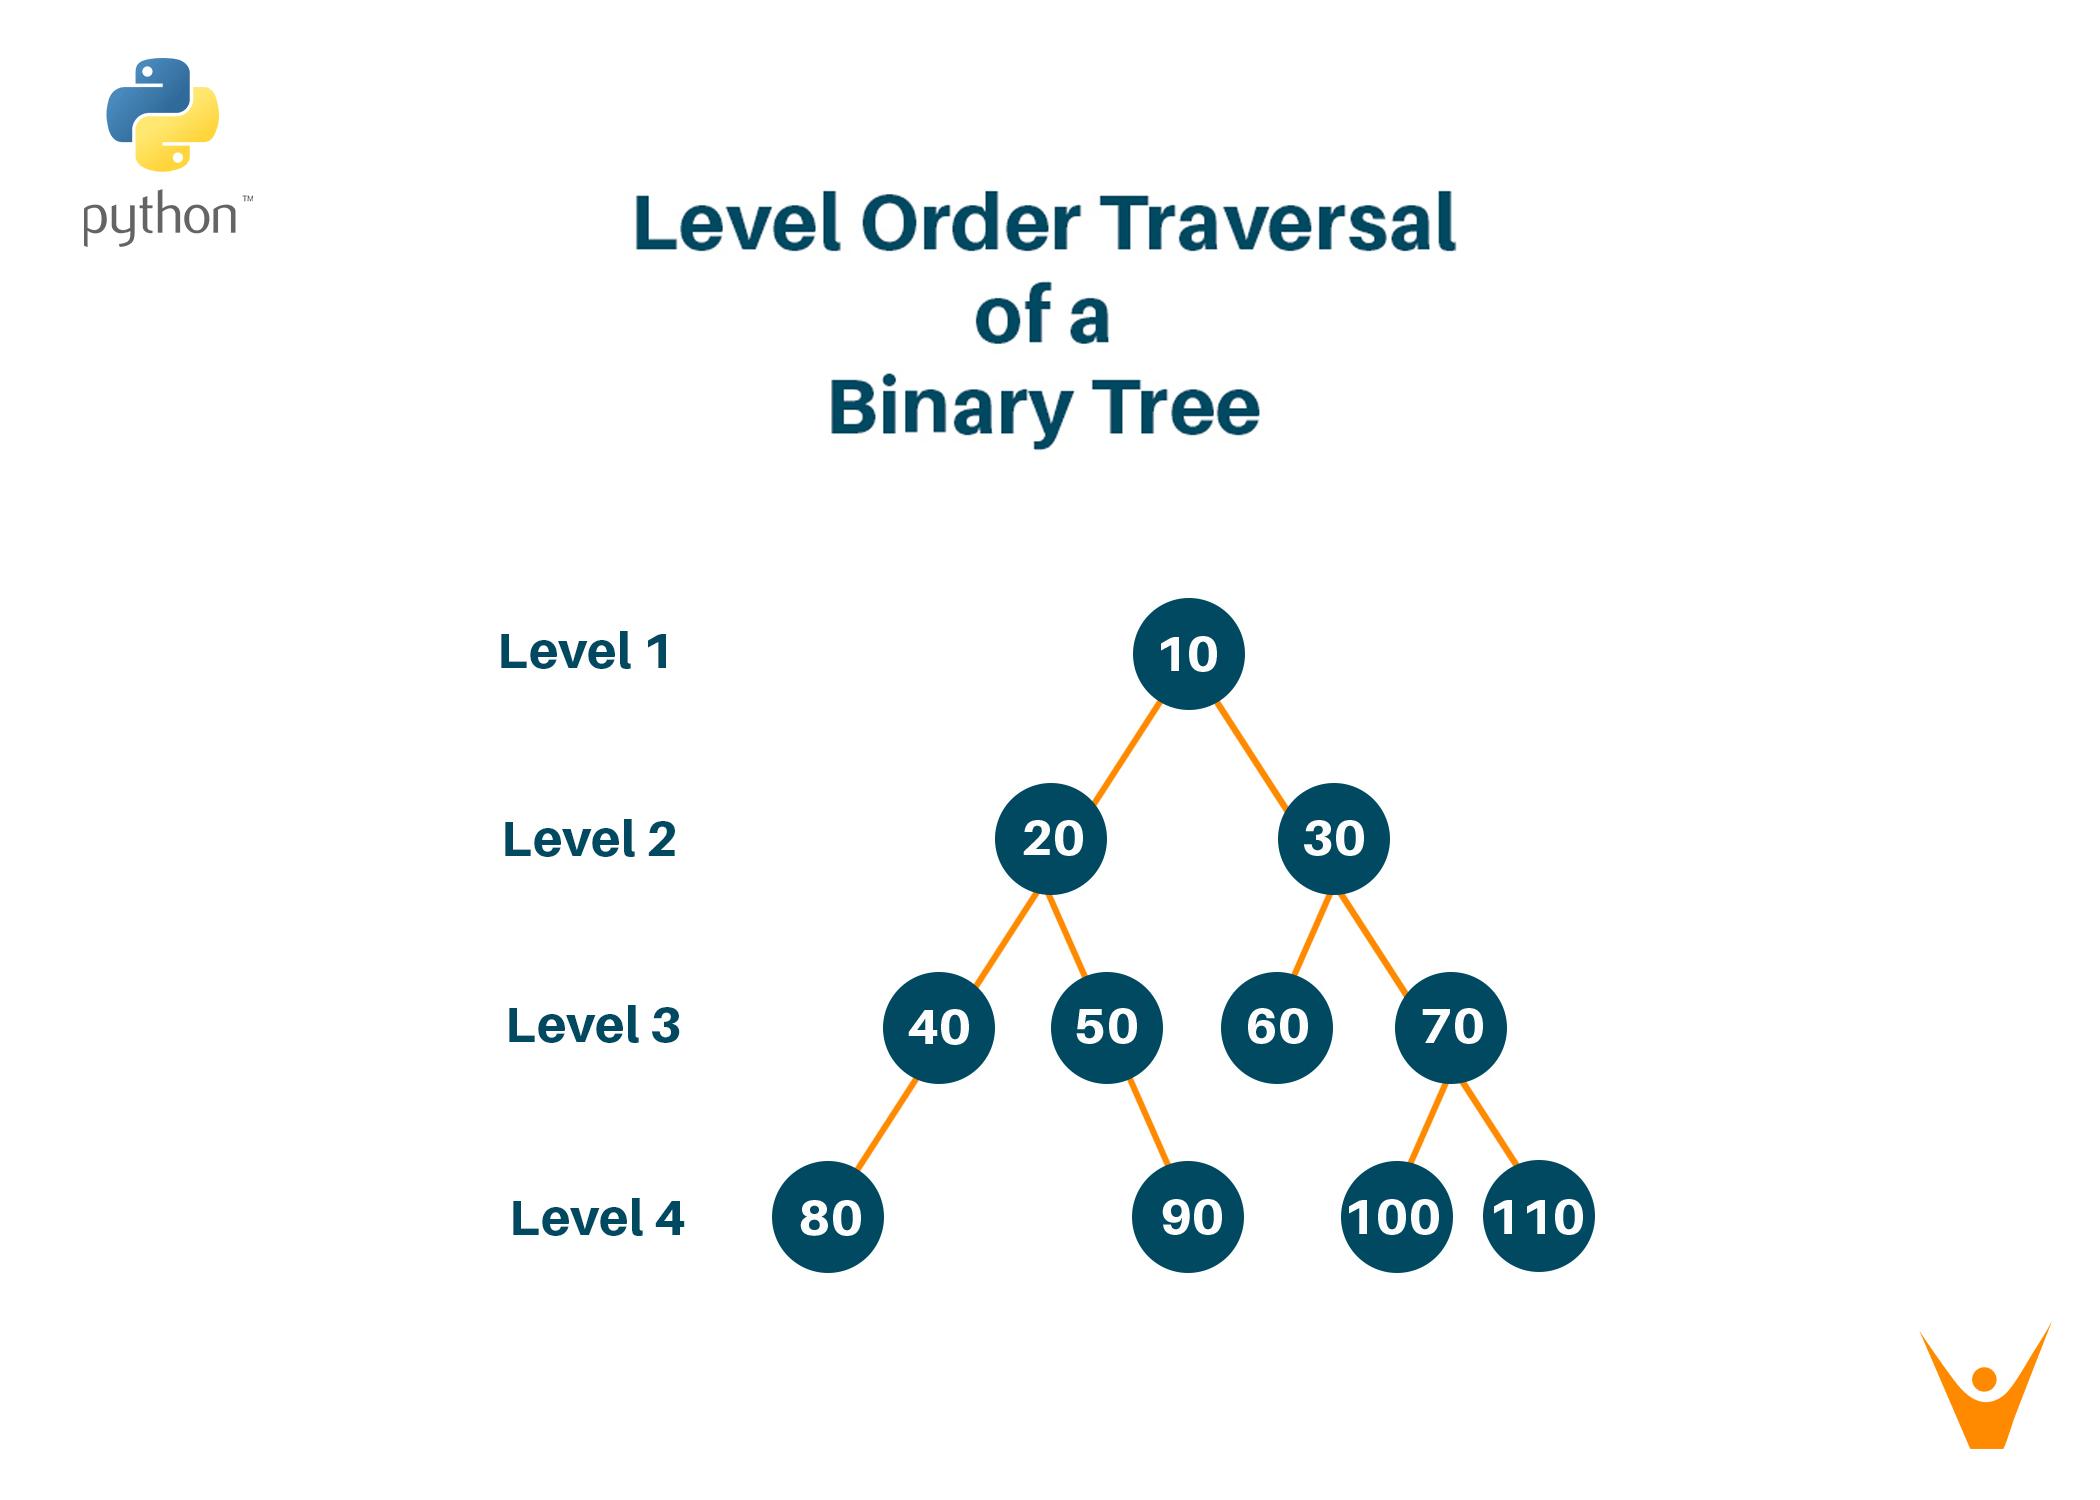 Level order traversal of binary tree (Python Code)